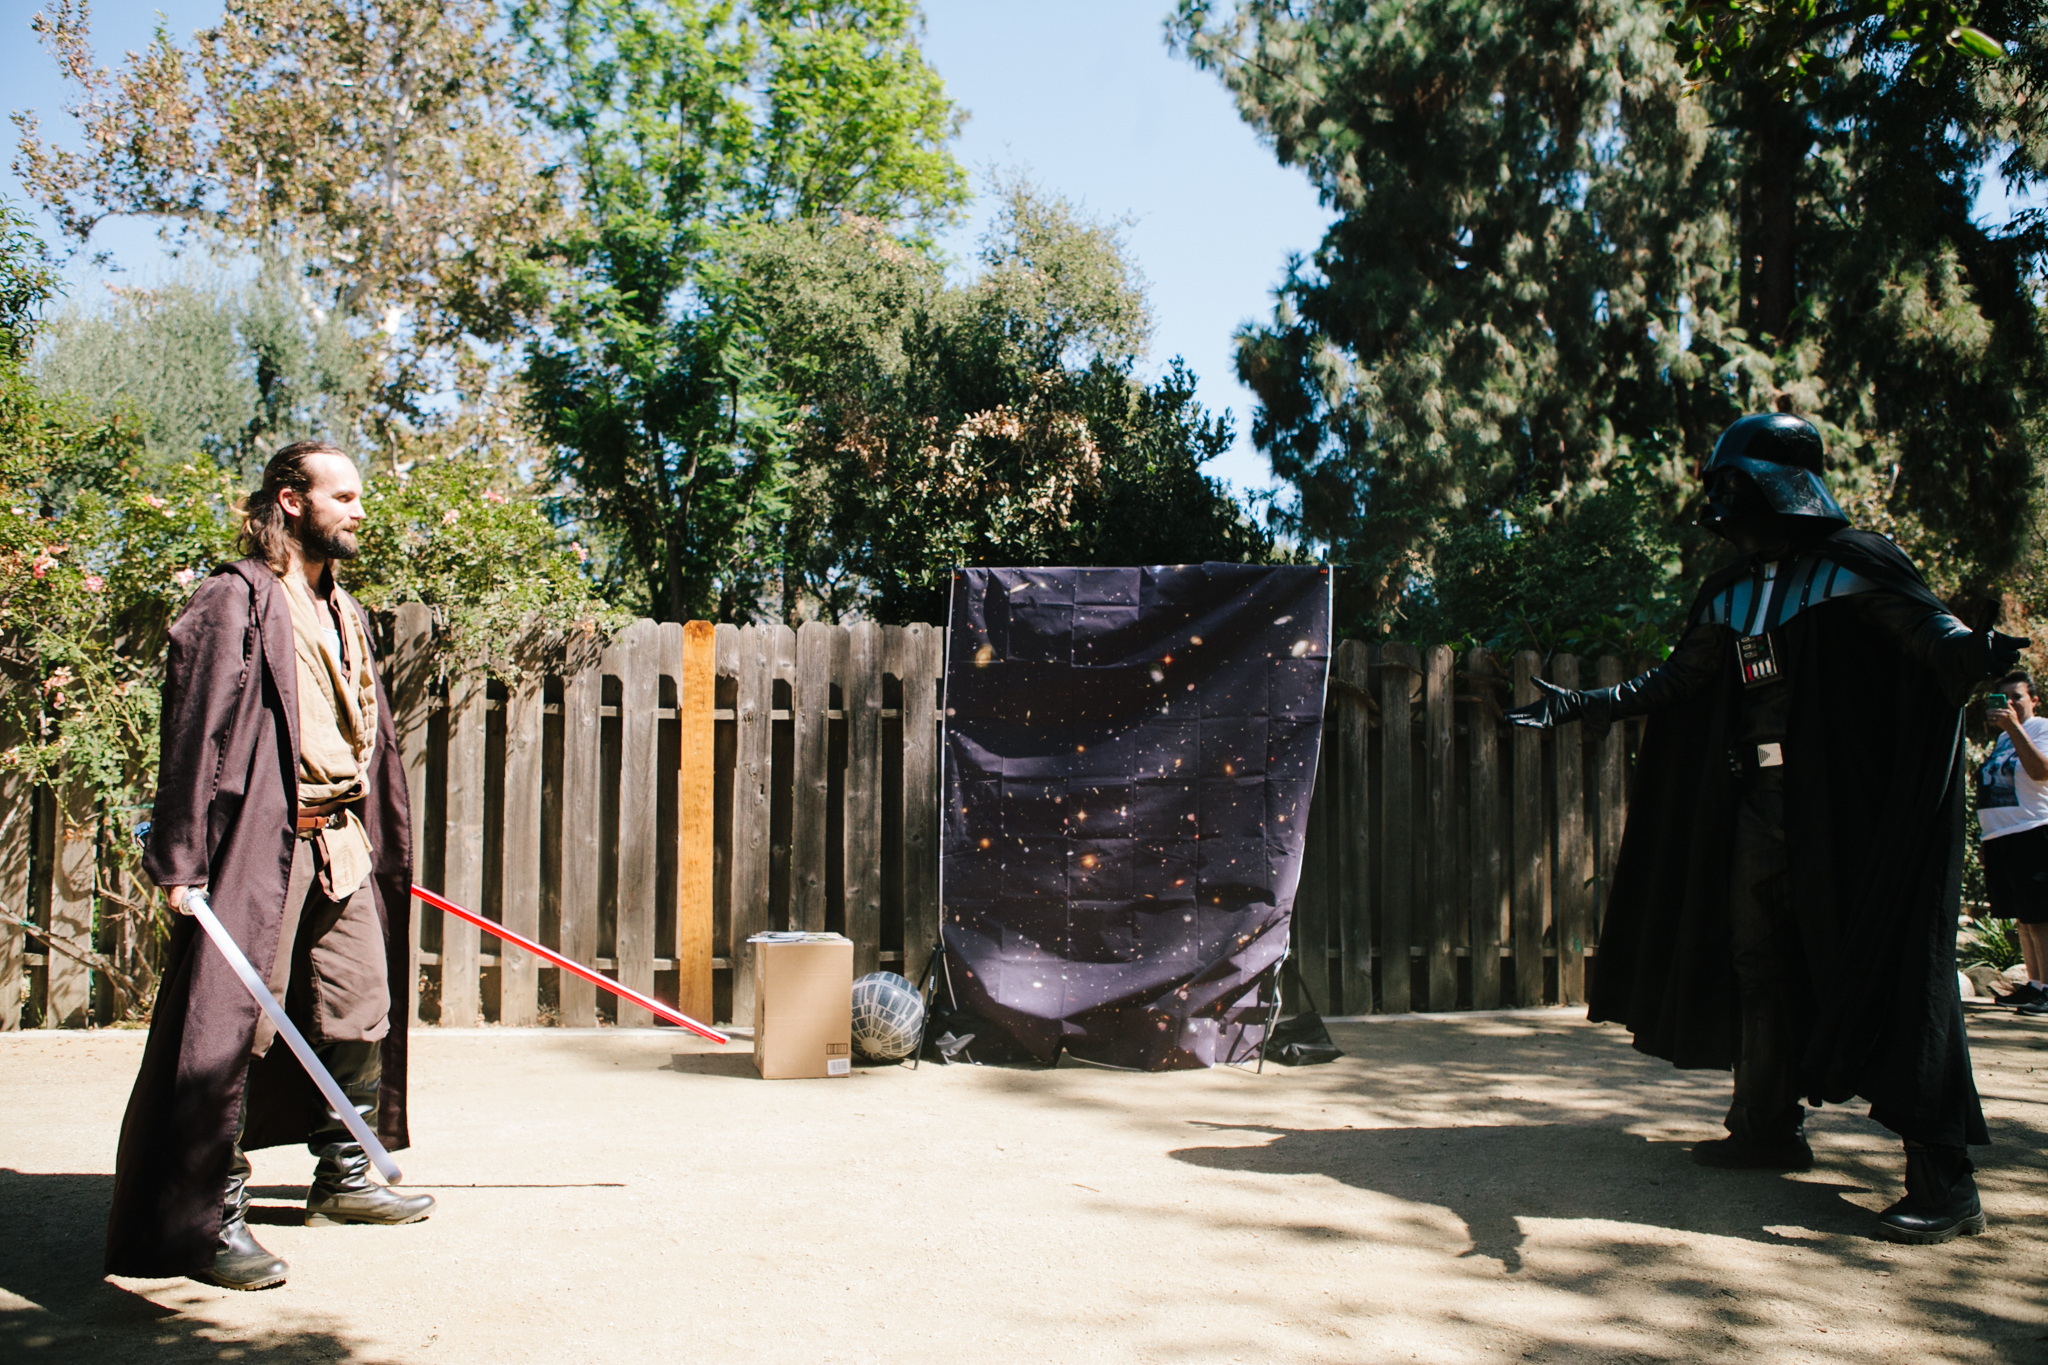 star wars birthday party-9313.jpg